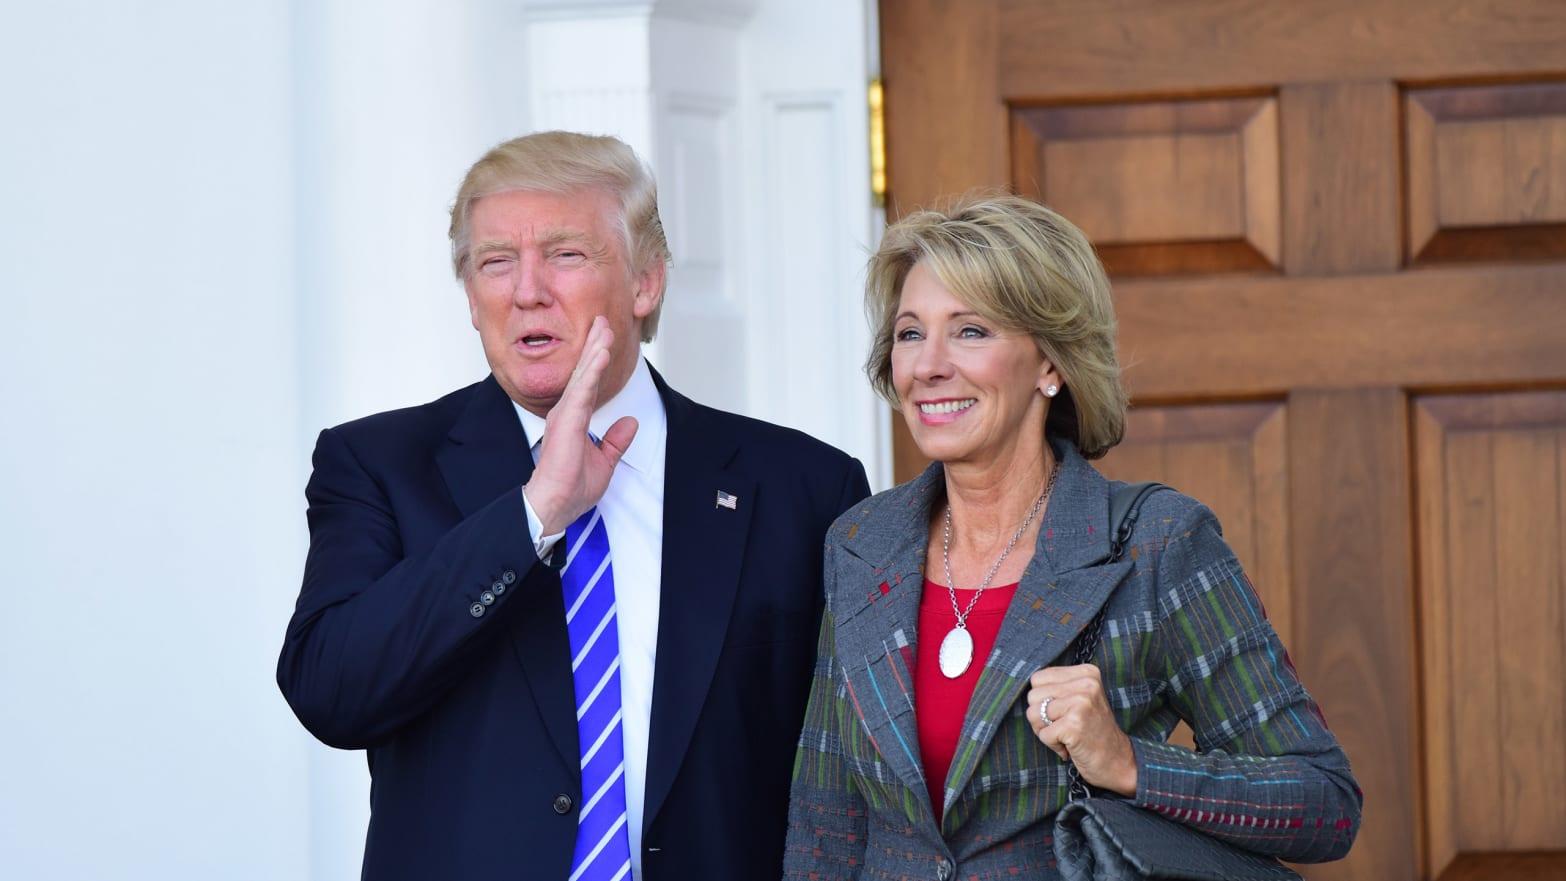 Betsy Devos Trumps Education Pick Has >> Betsy Devos Trump S Education Pick Could Make Life Hell For Lgbt Youth